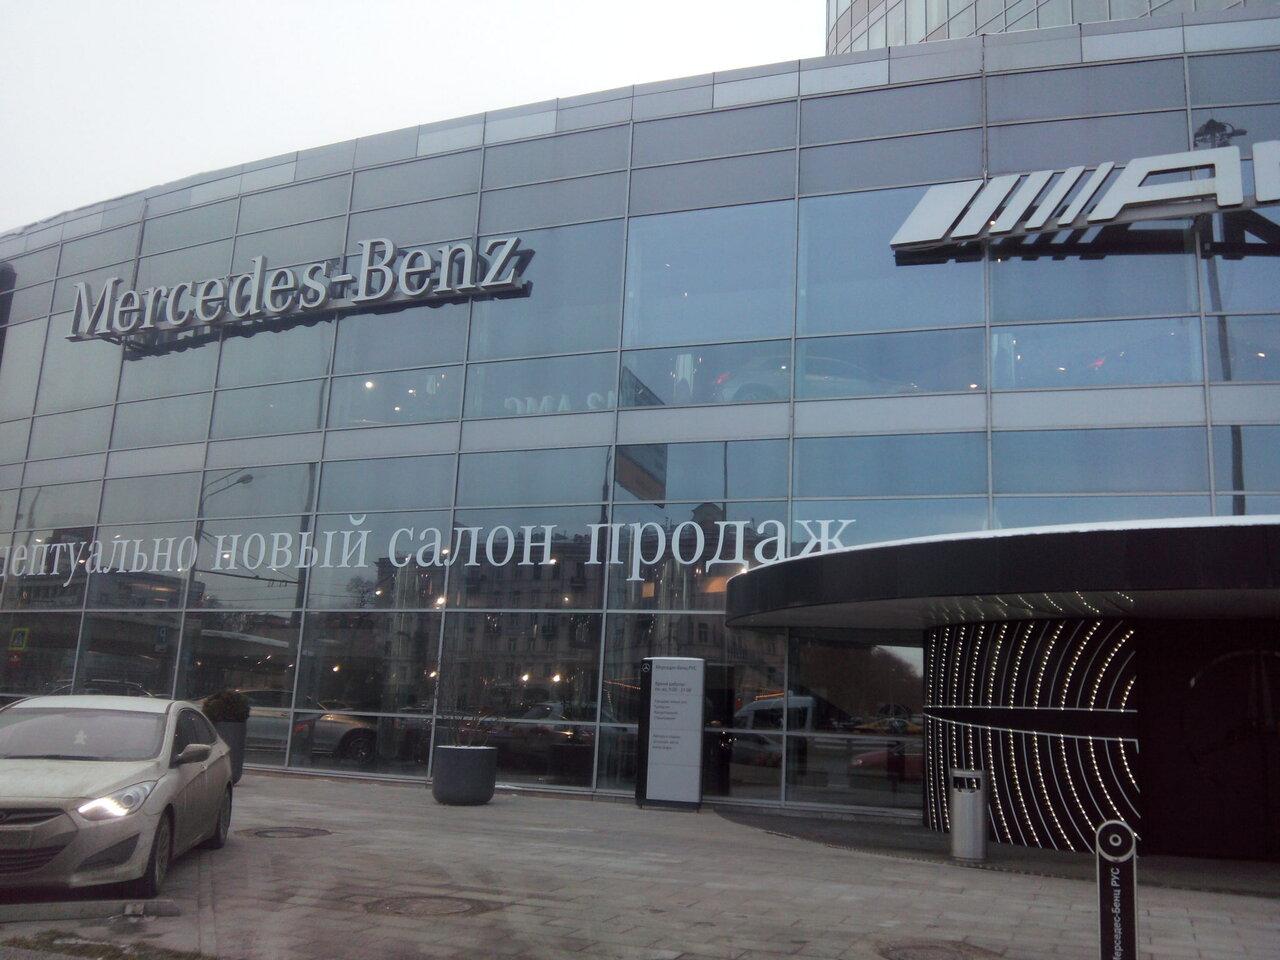 Автосалон мерседес москва ленинградская 39 авто под залог в череповце